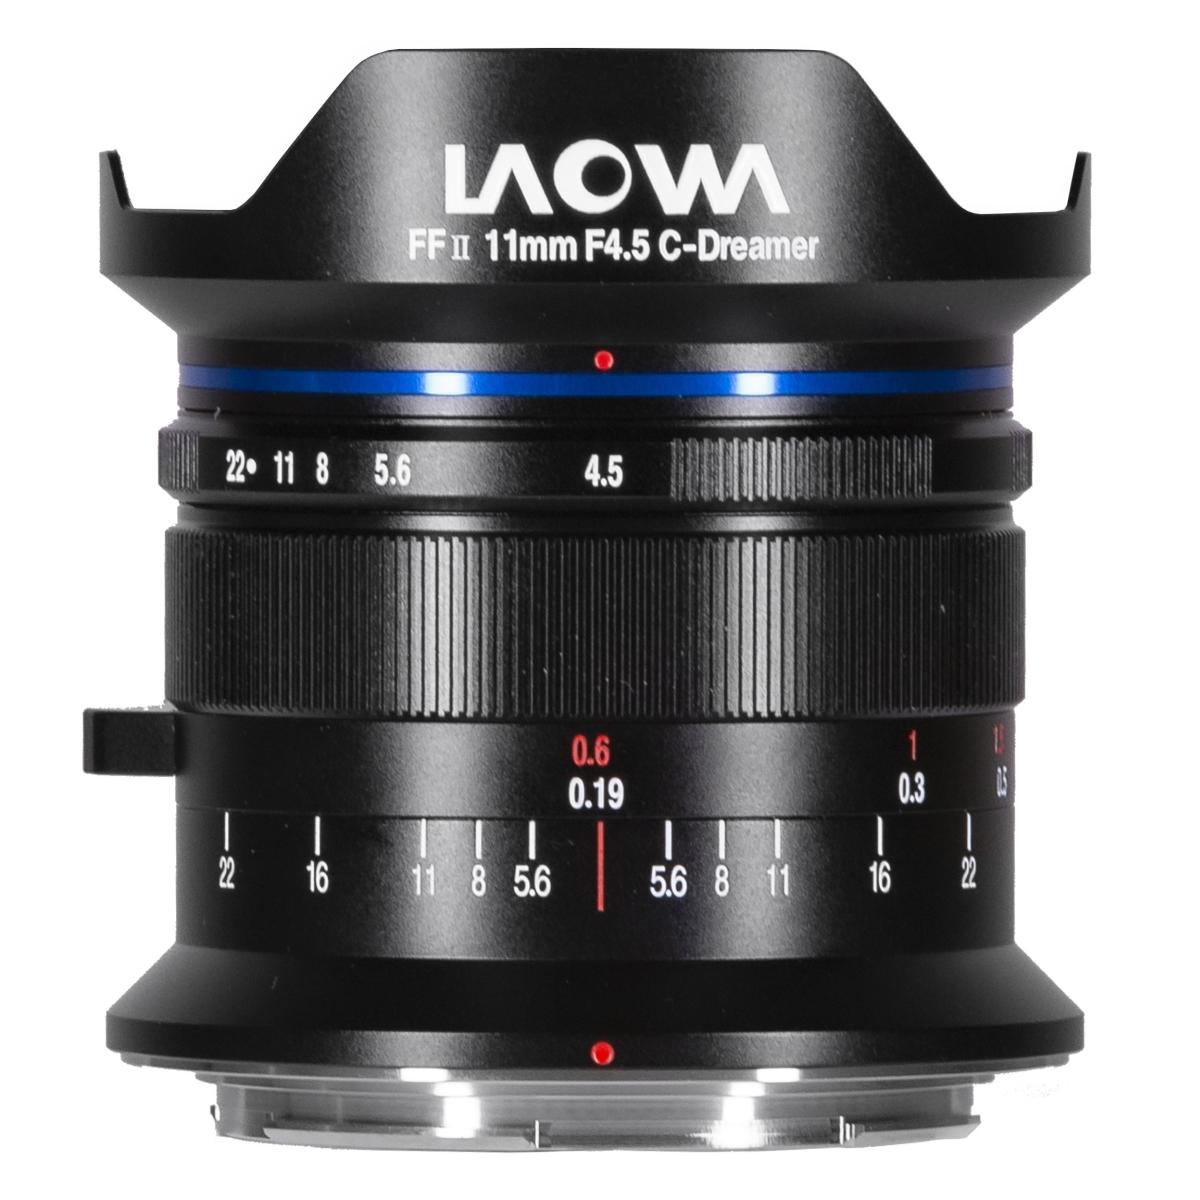 Laowa 11 mm 1:4,5 FF RL für Canon RF